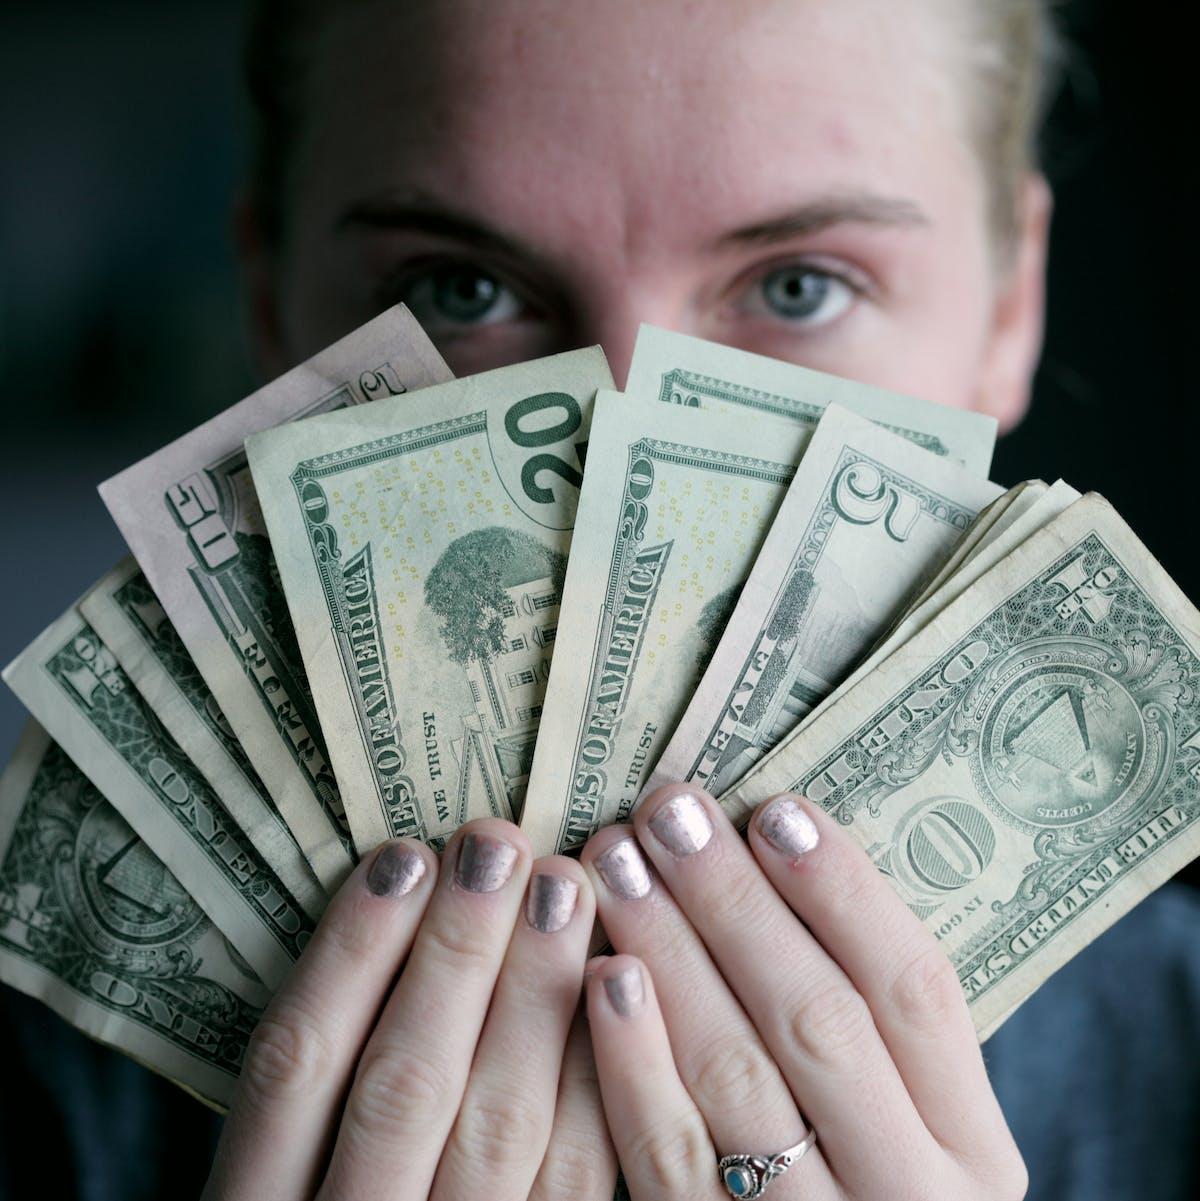 A Money Behaviorist Explains Why UBI Can Positively Support Mental Health